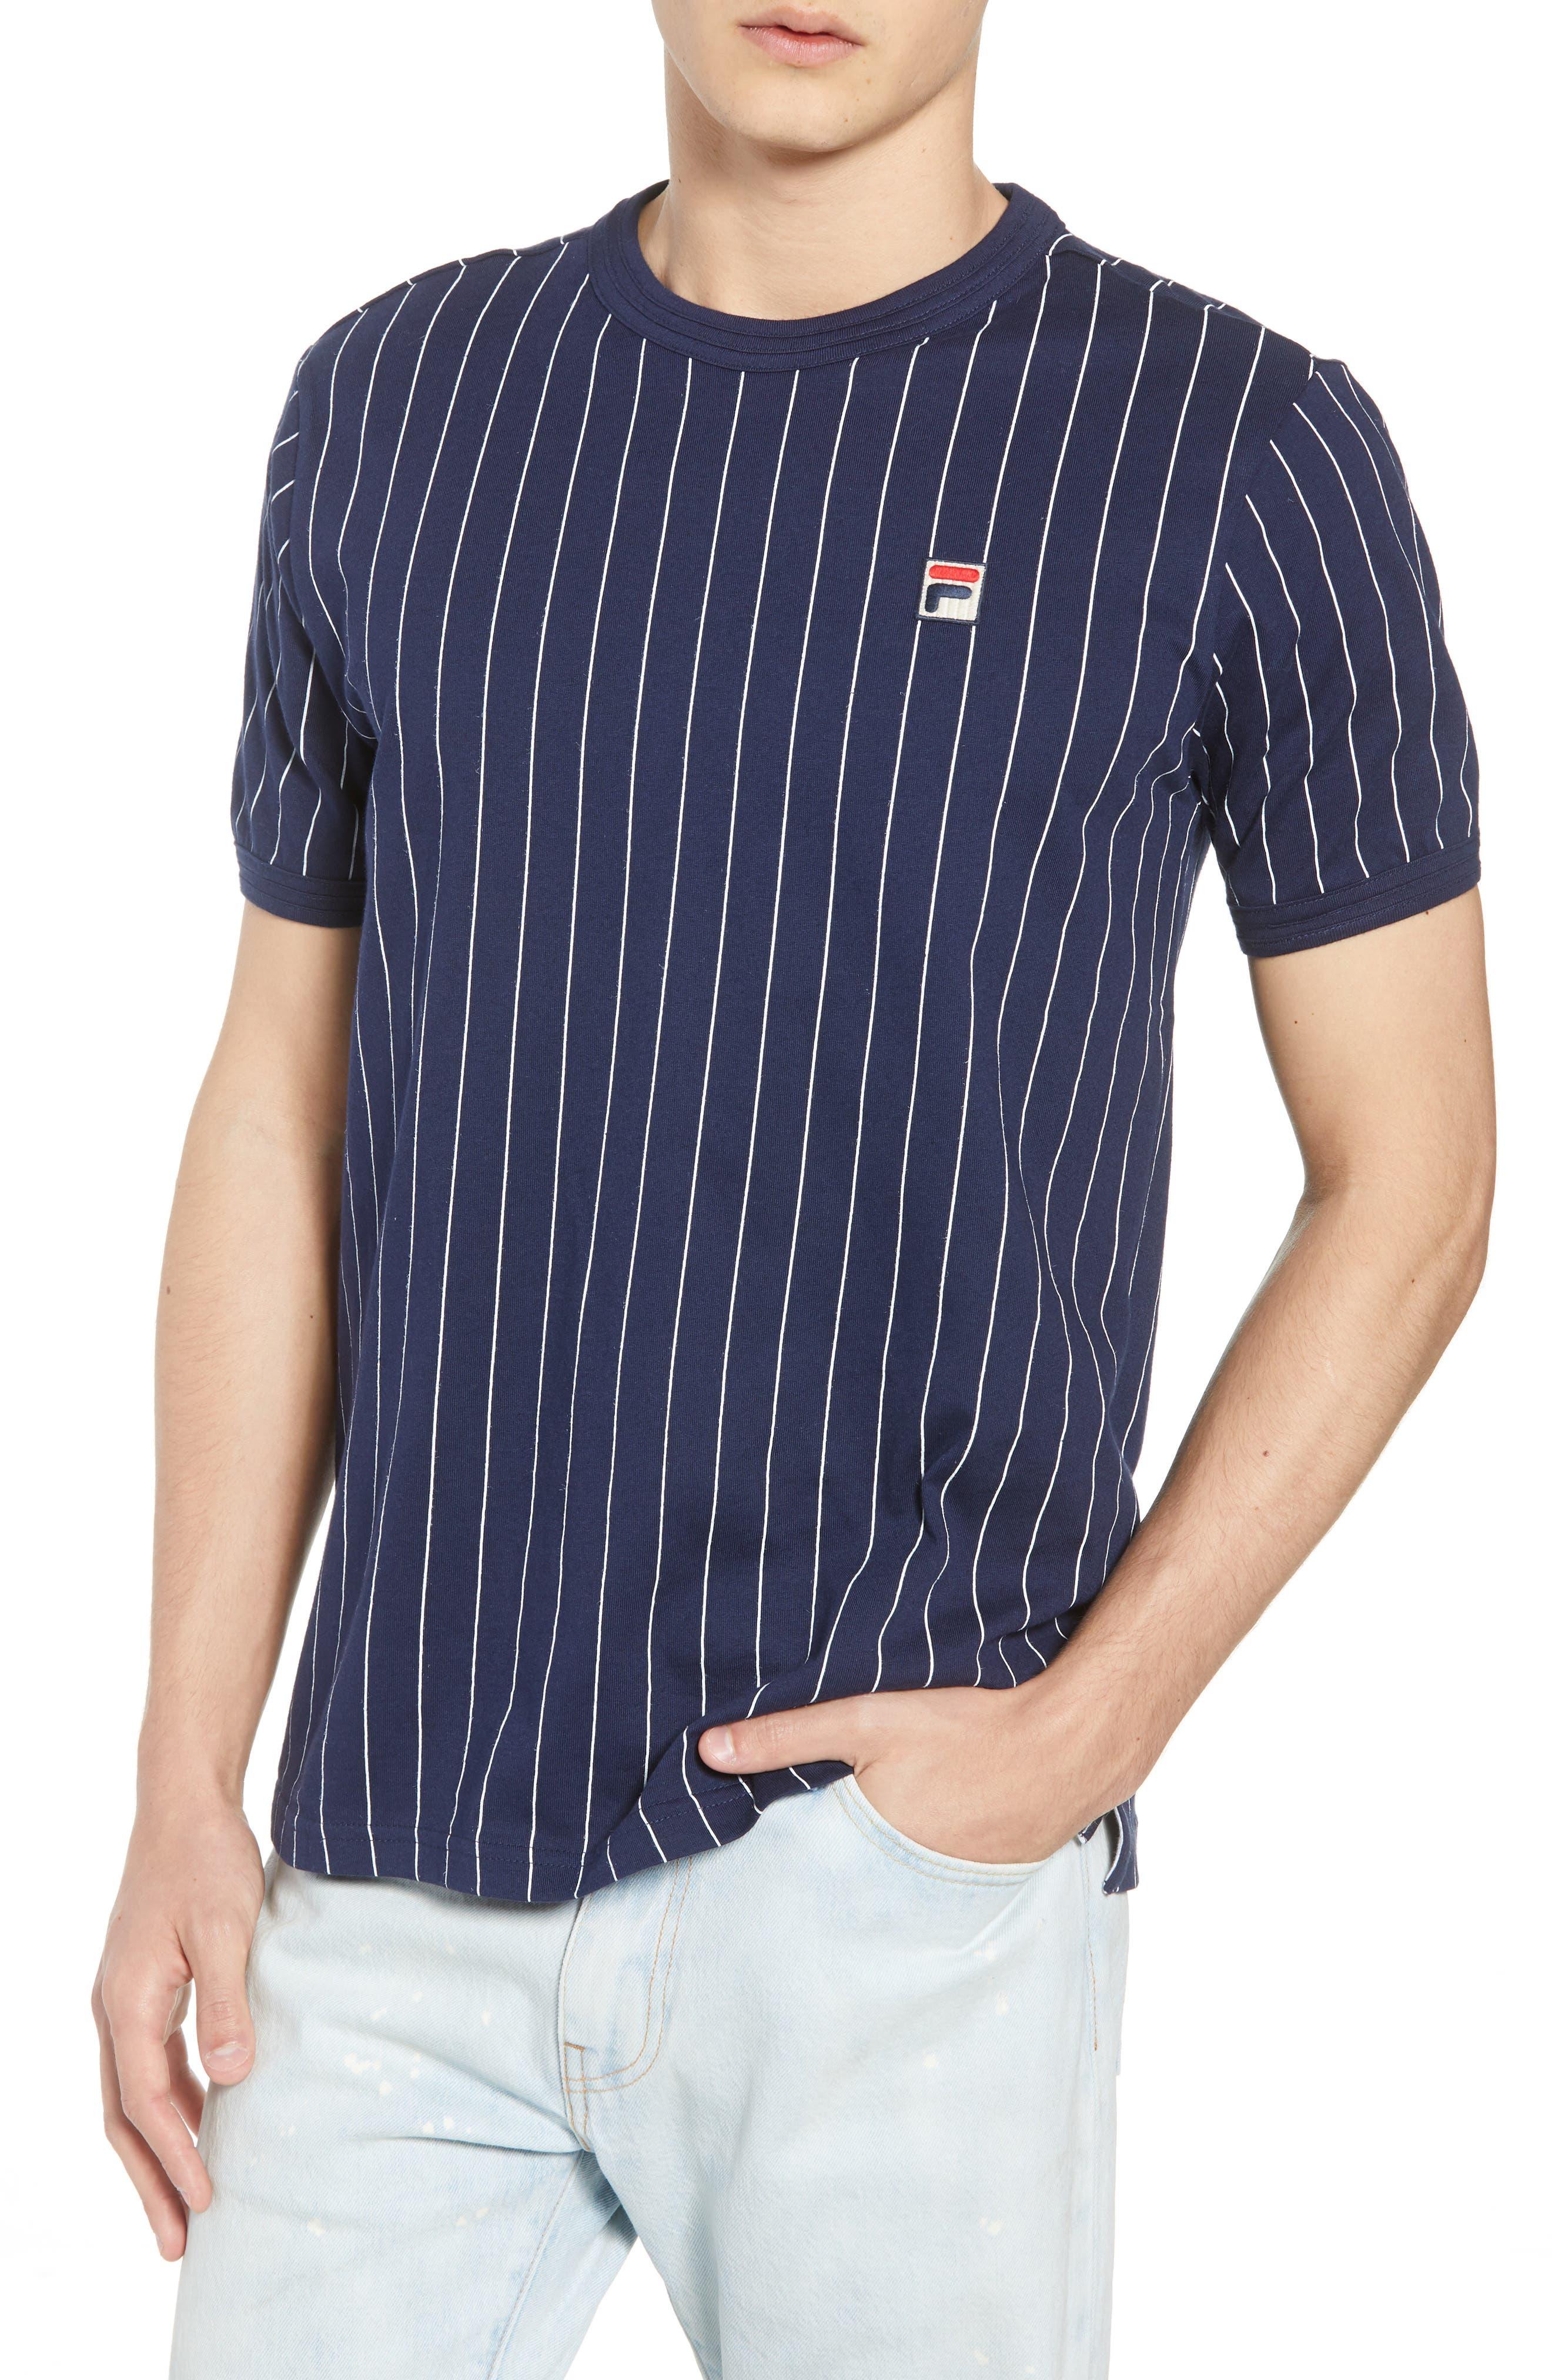 Fila Guilo T-Shirt, Blue